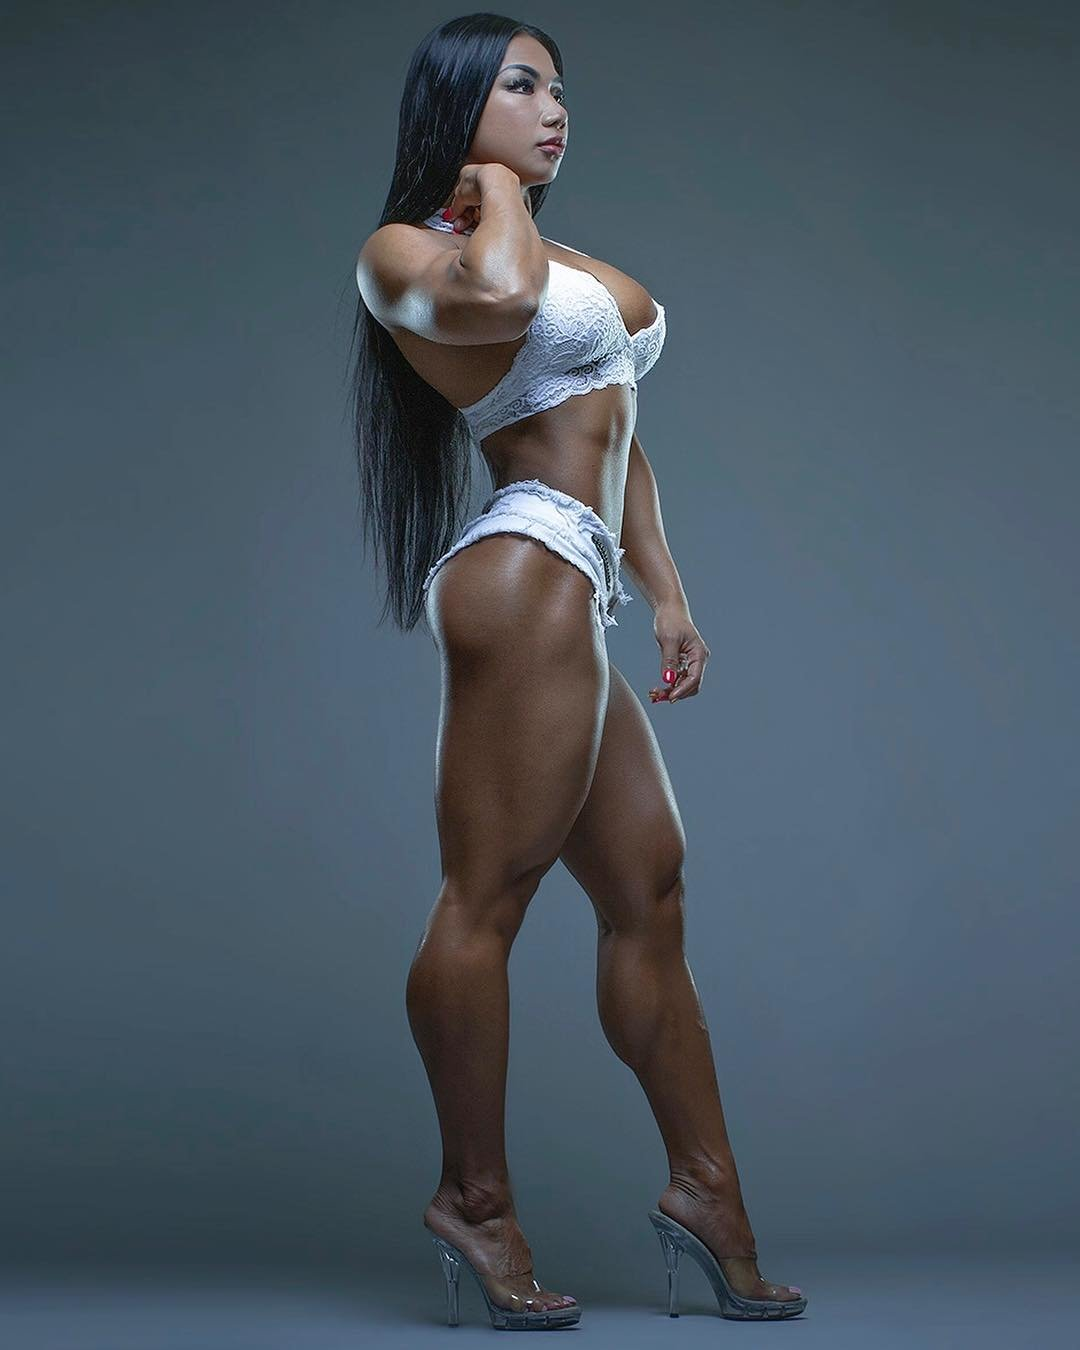 Asian fitness bikini